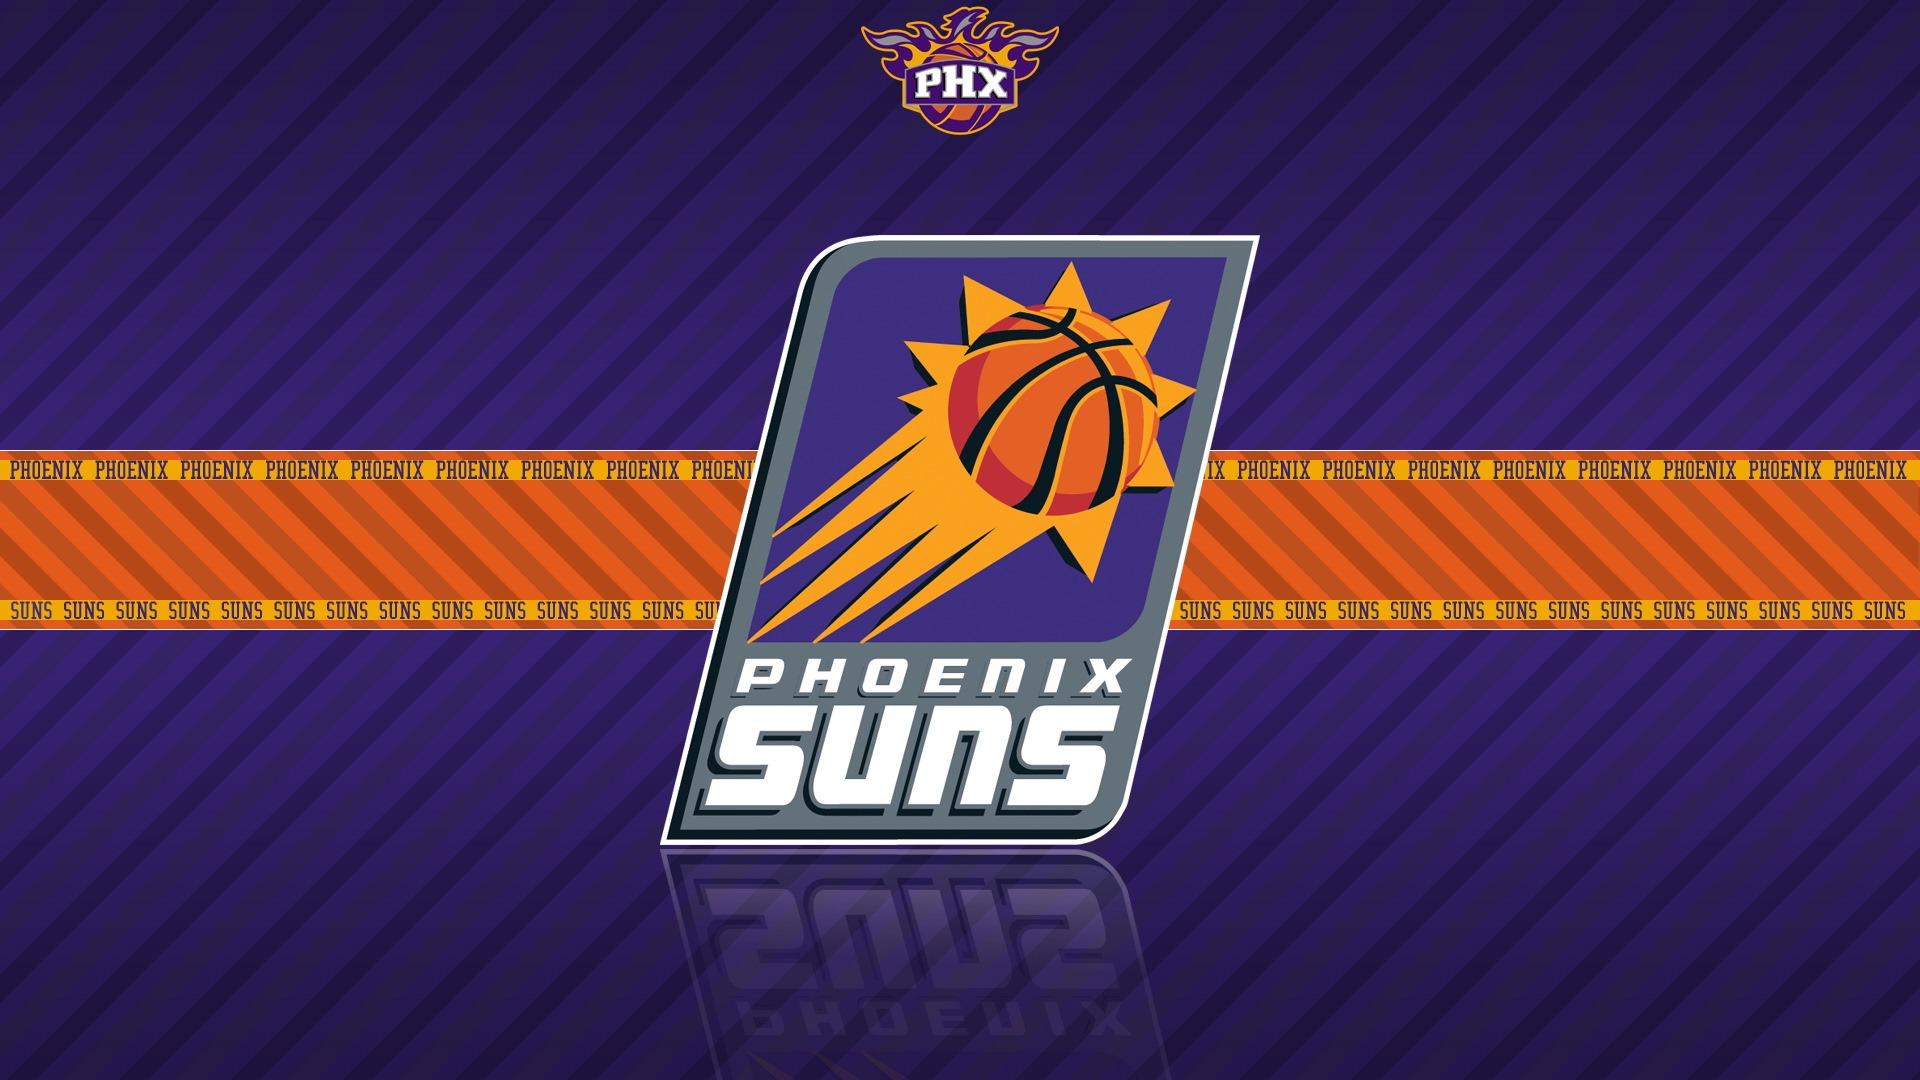 44+ Phoenix Suns Wallpaper 2015 on WallpaperSafari